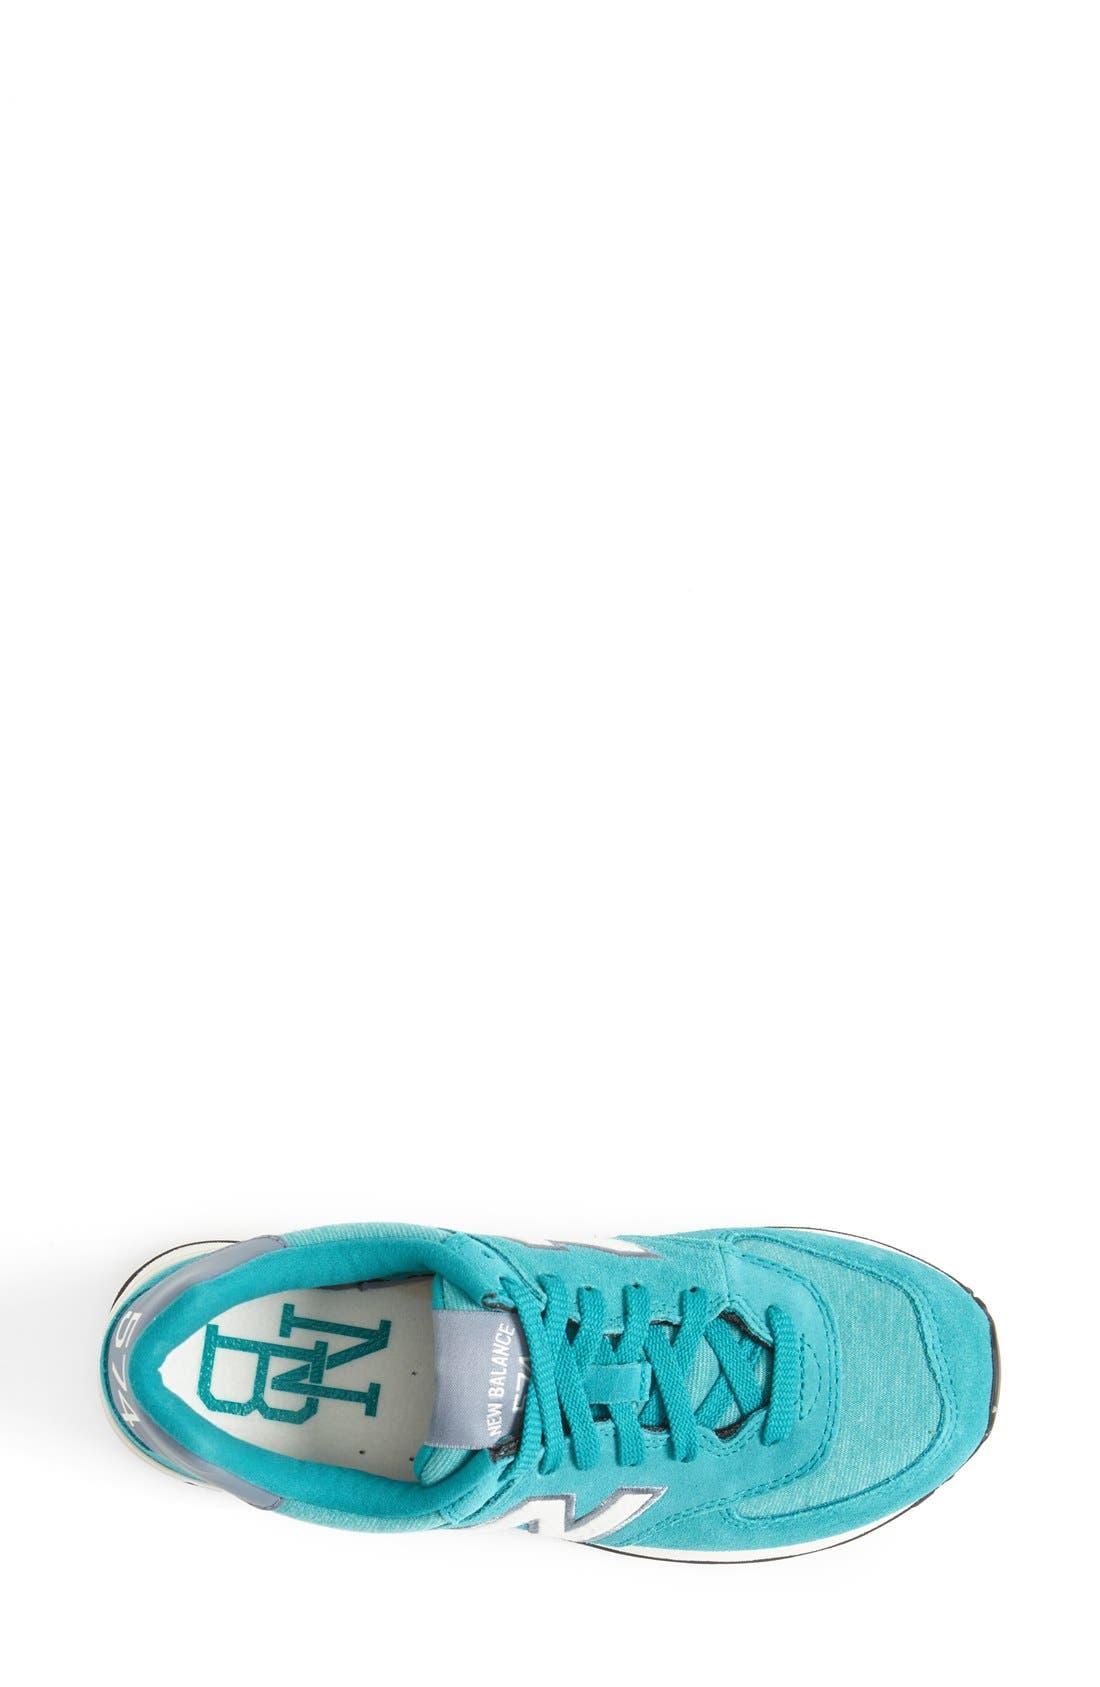 Alternate Image 3  - New Balance '574' Sneaker (Women)